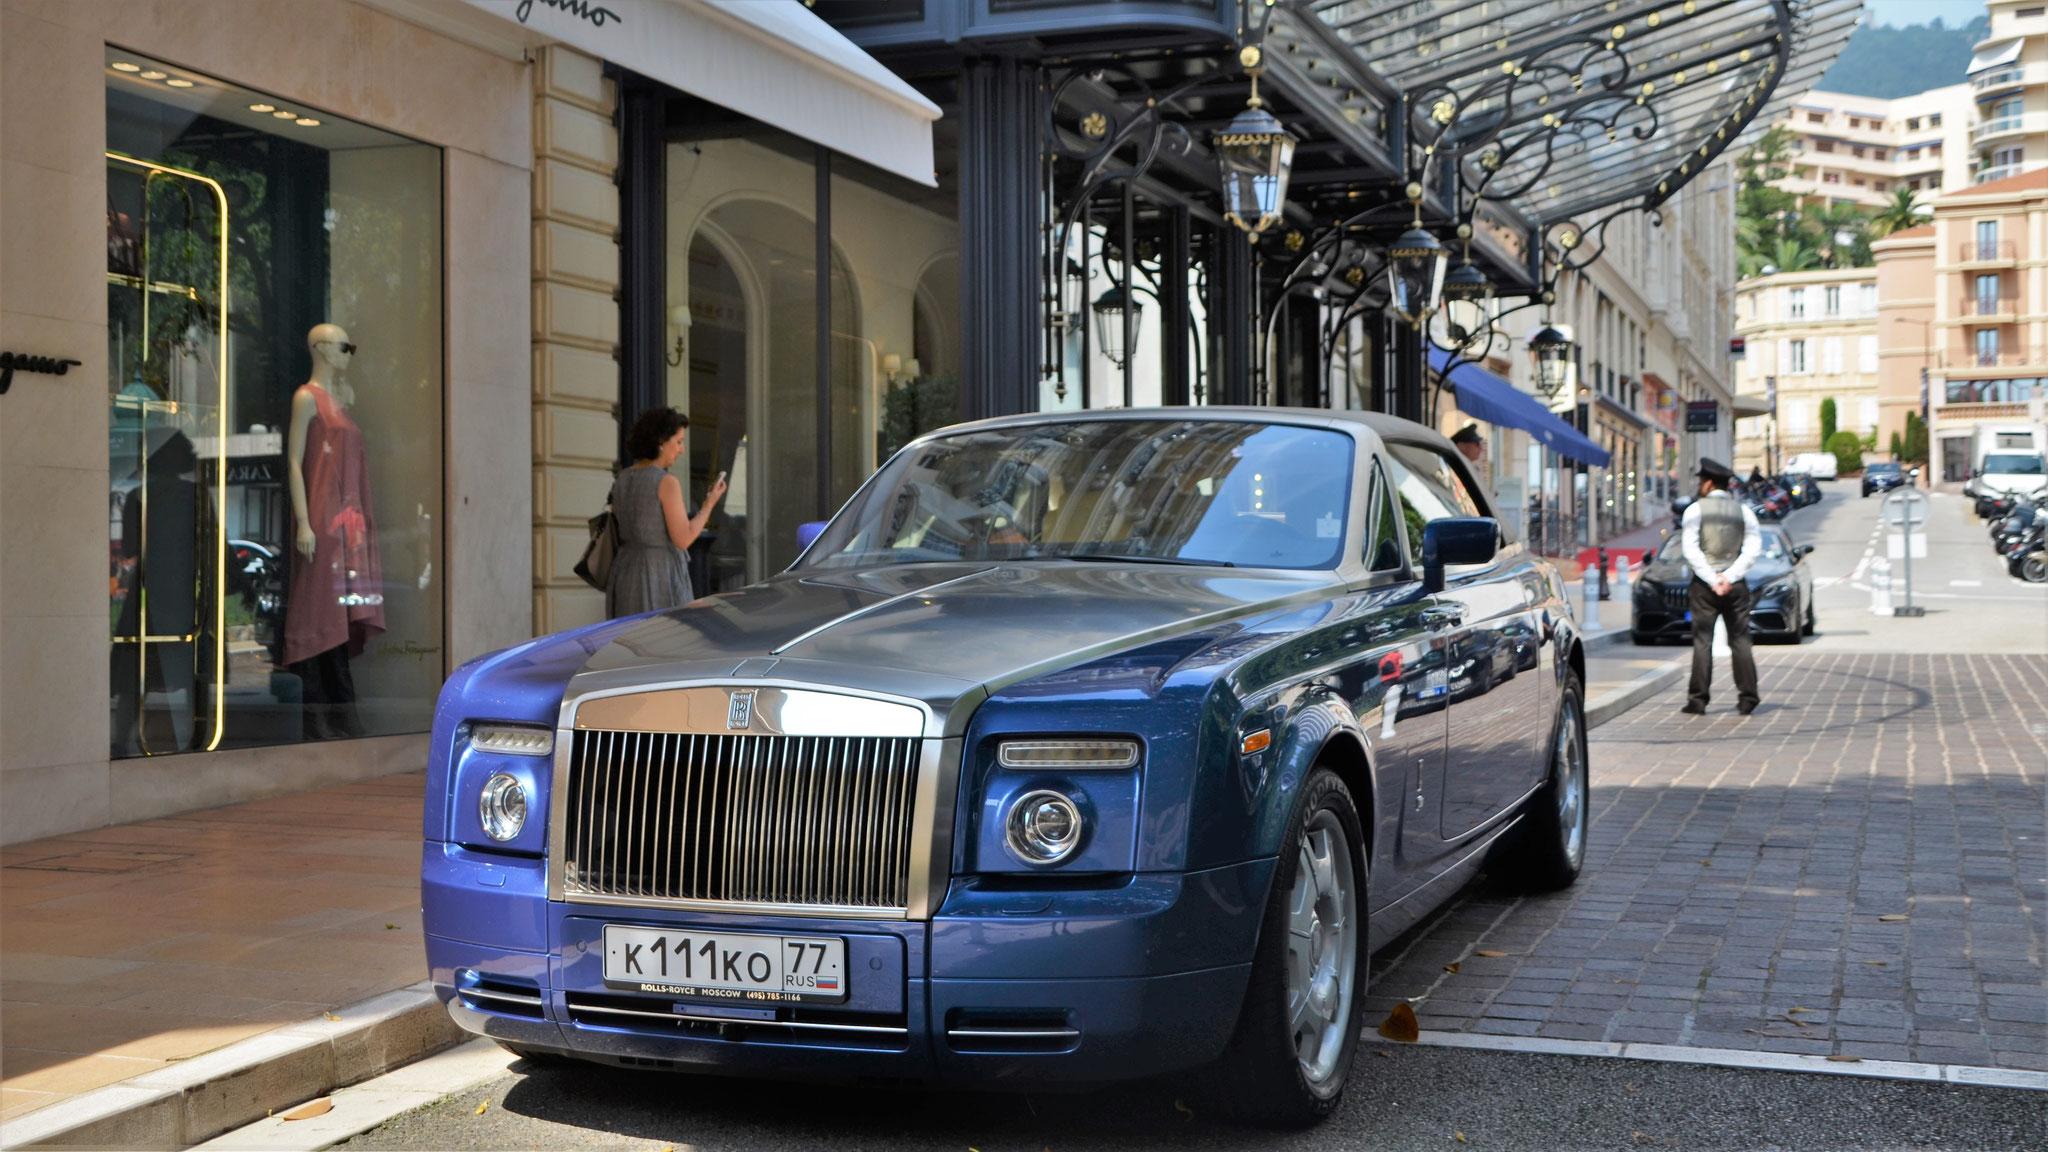 Rolls Royce Drophead - K-111-KO-77 (RUS)